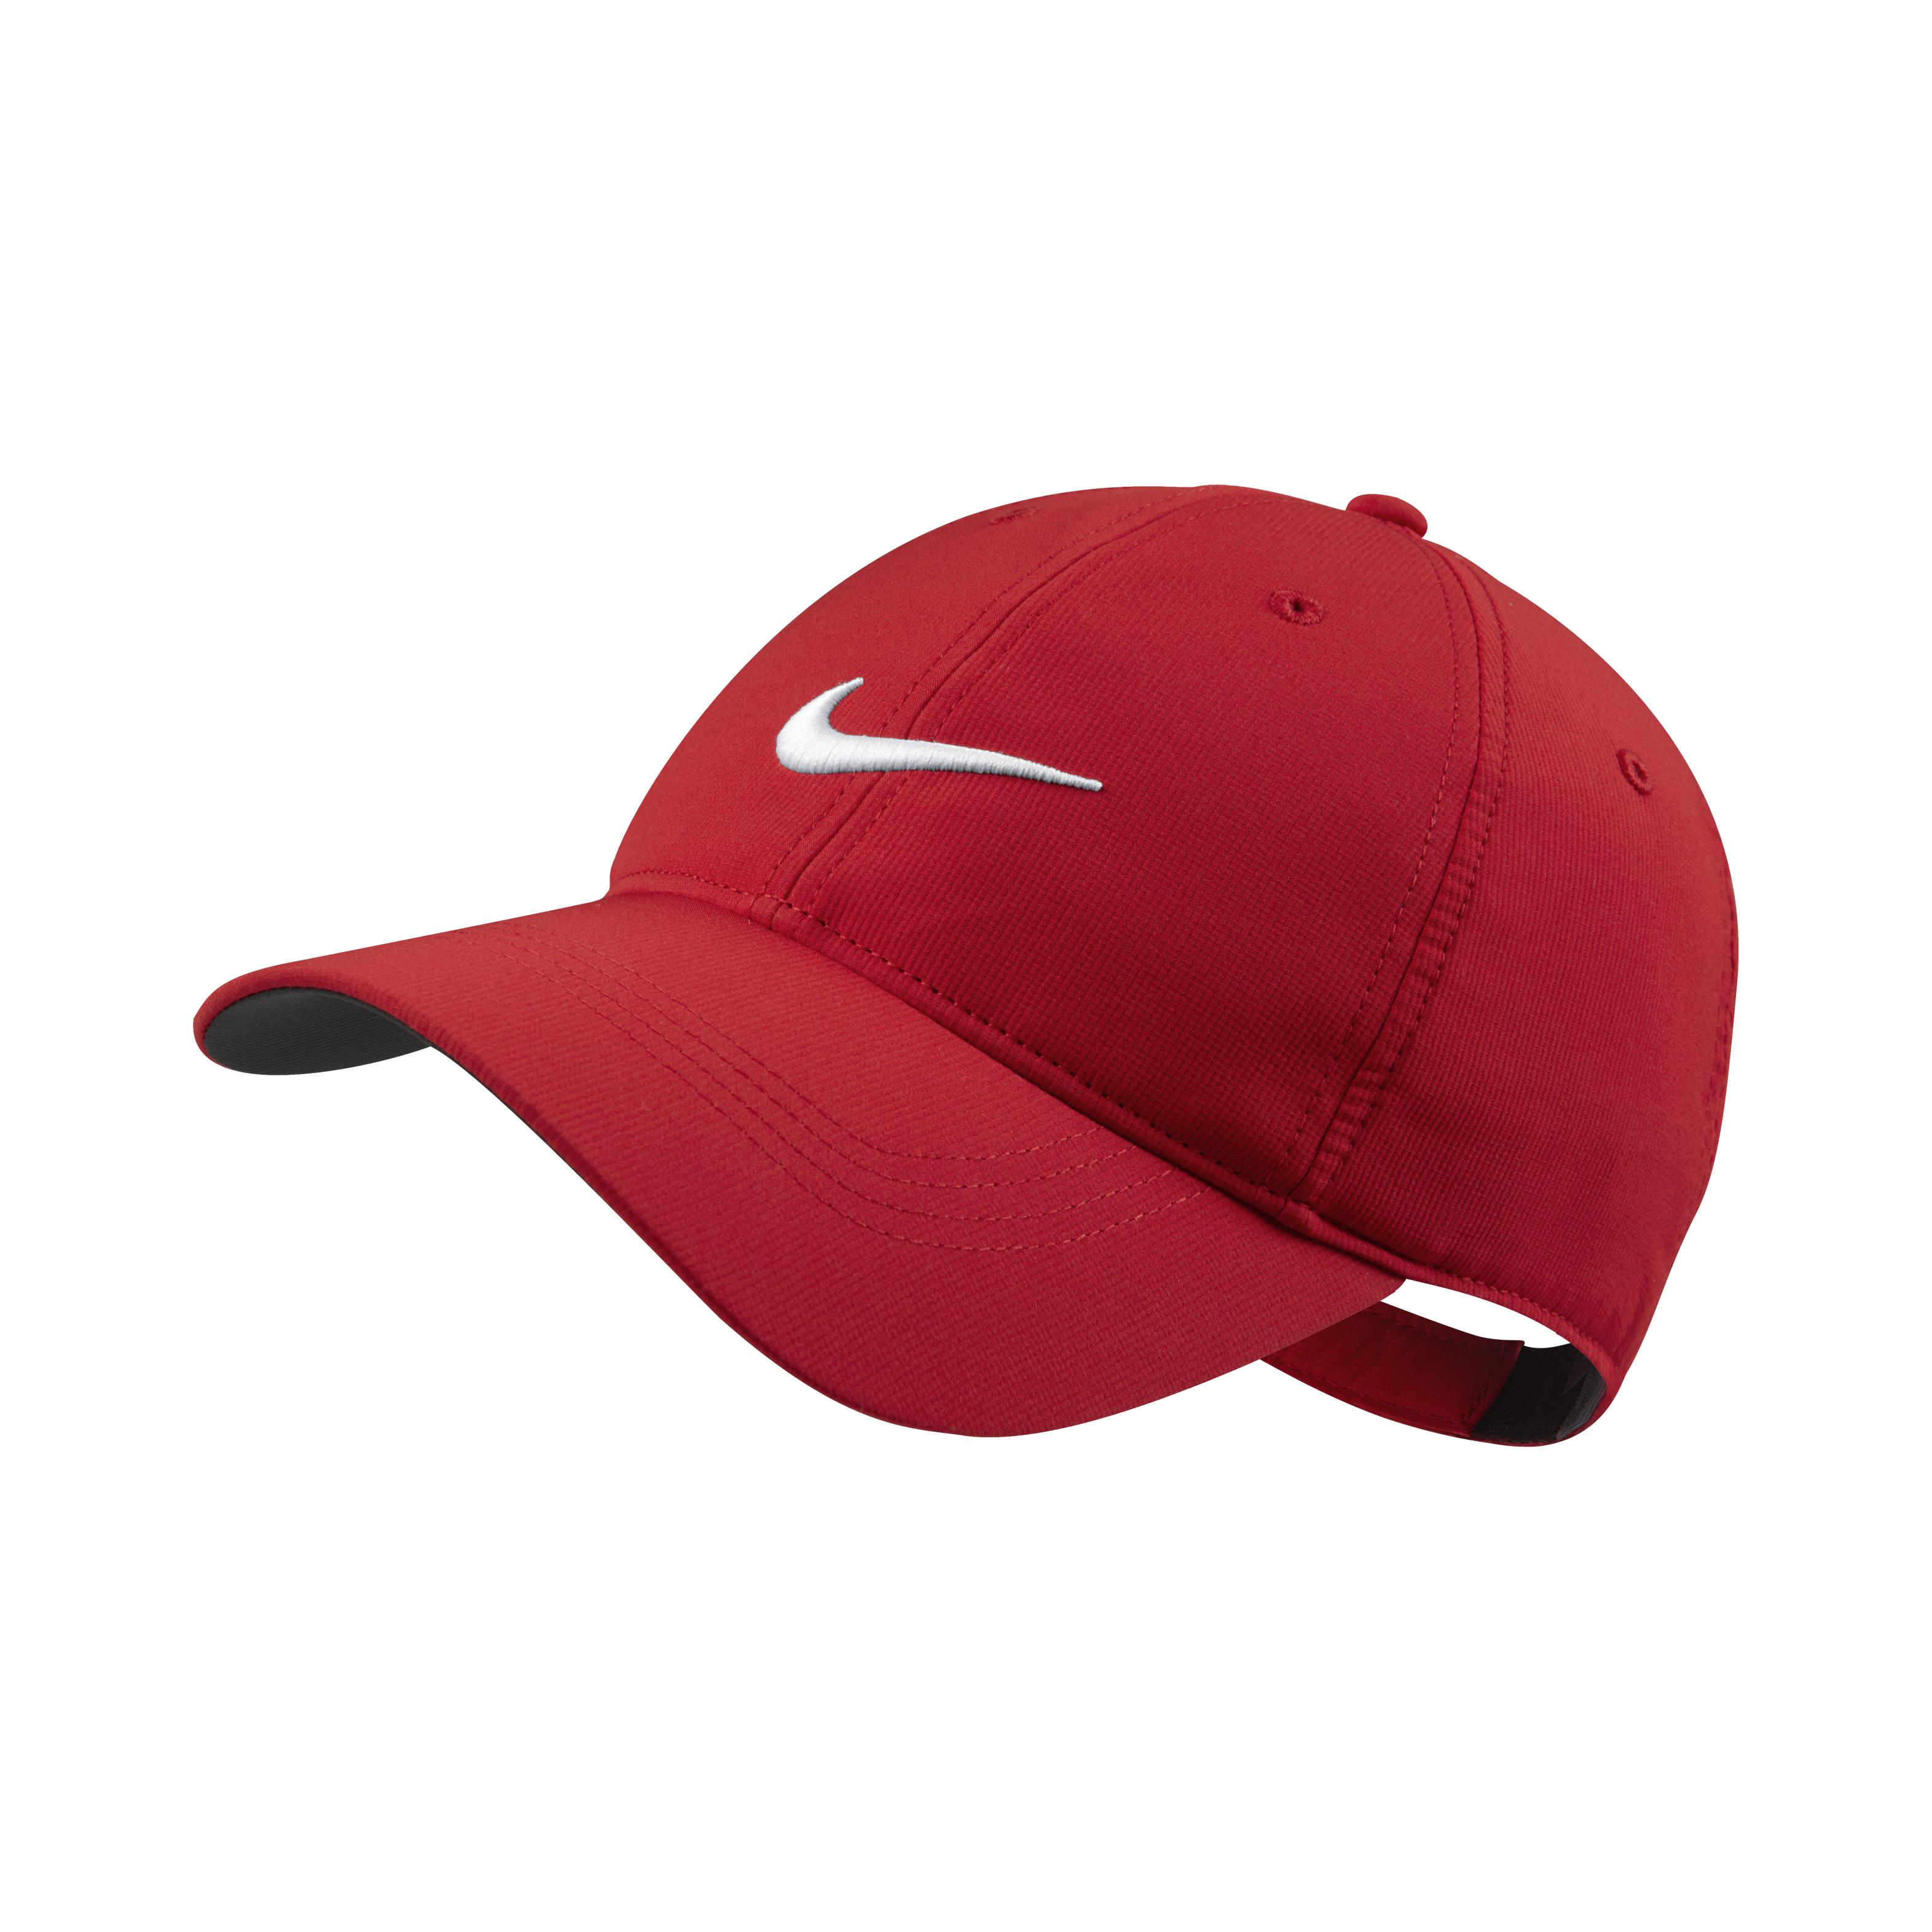 d1e660e79f7 Nike Adult Unisex Tech Swoosh Cap Red – Gear Up Pro Shop